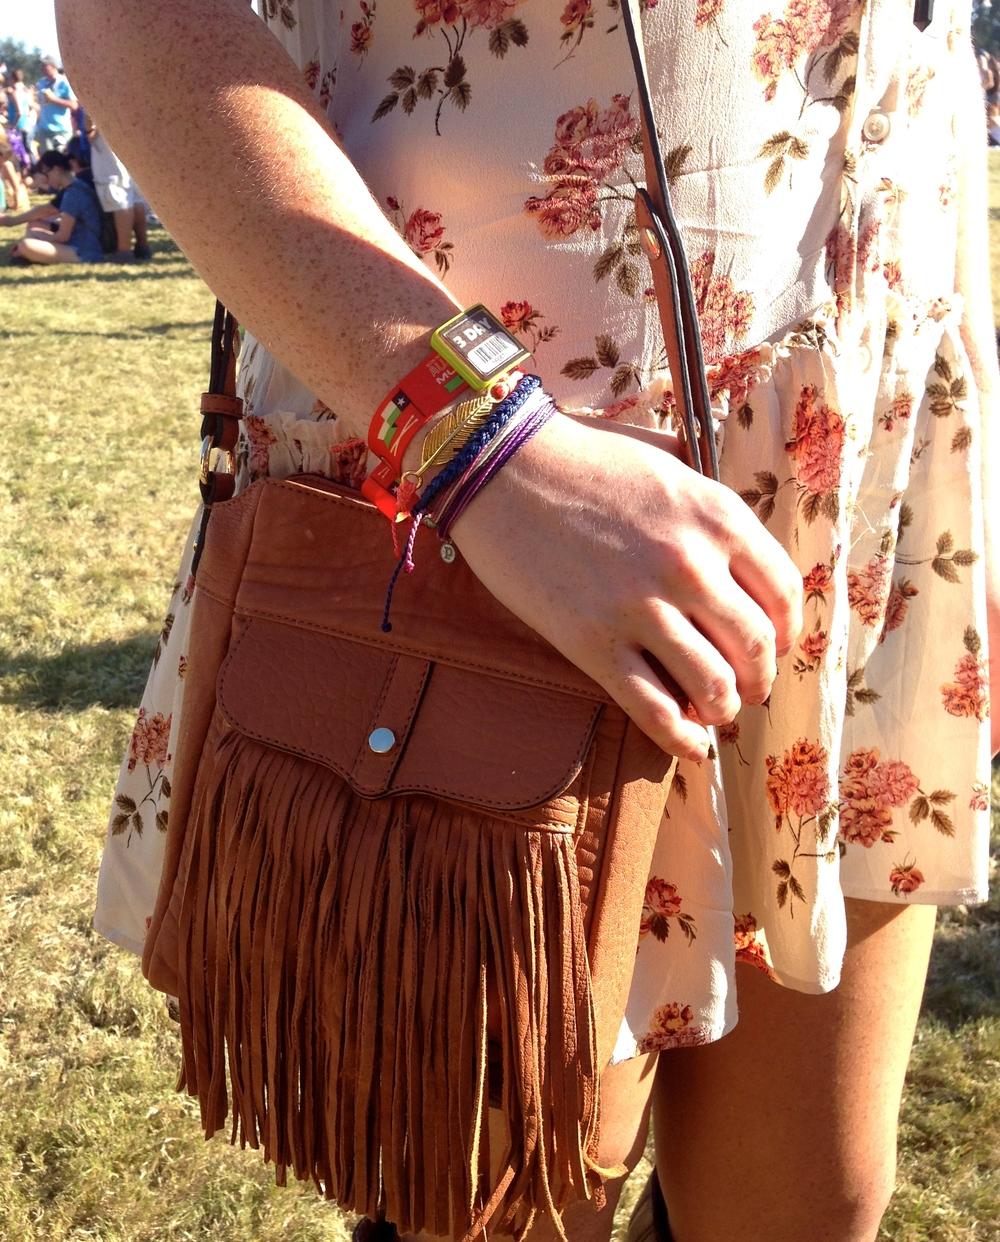 Pura Vida Bracelets were a fabulous accessory to the 3 Day pass wristband. Huge thank you to Pura Vida for sending us these bracelets! Bracelets- Pura Vida, Bag- Rebecca Minkoff: Similar Here and Here